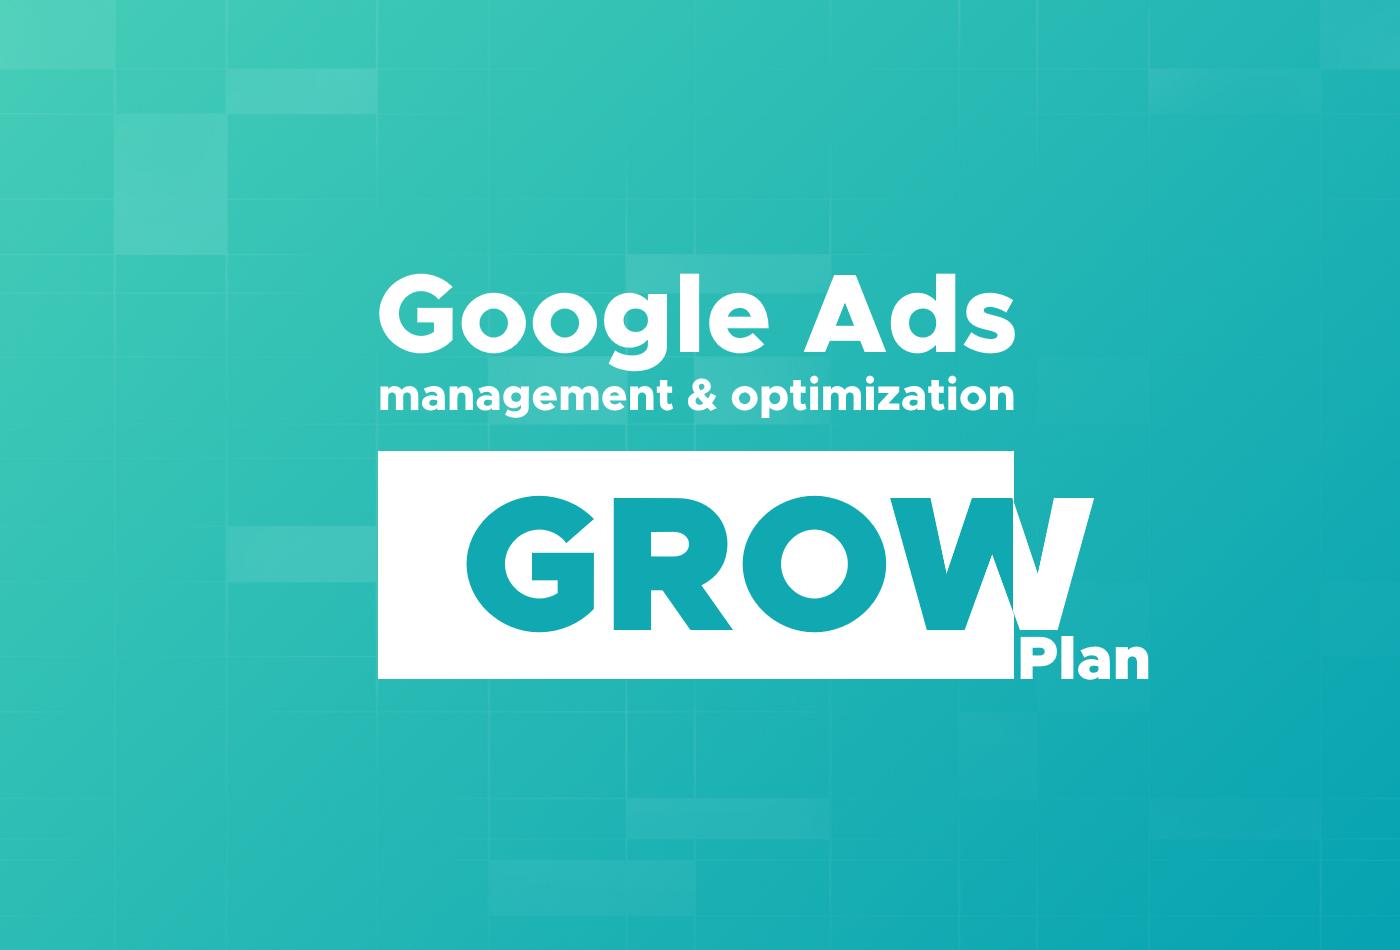 Google Ads management and optimization Grow Plan